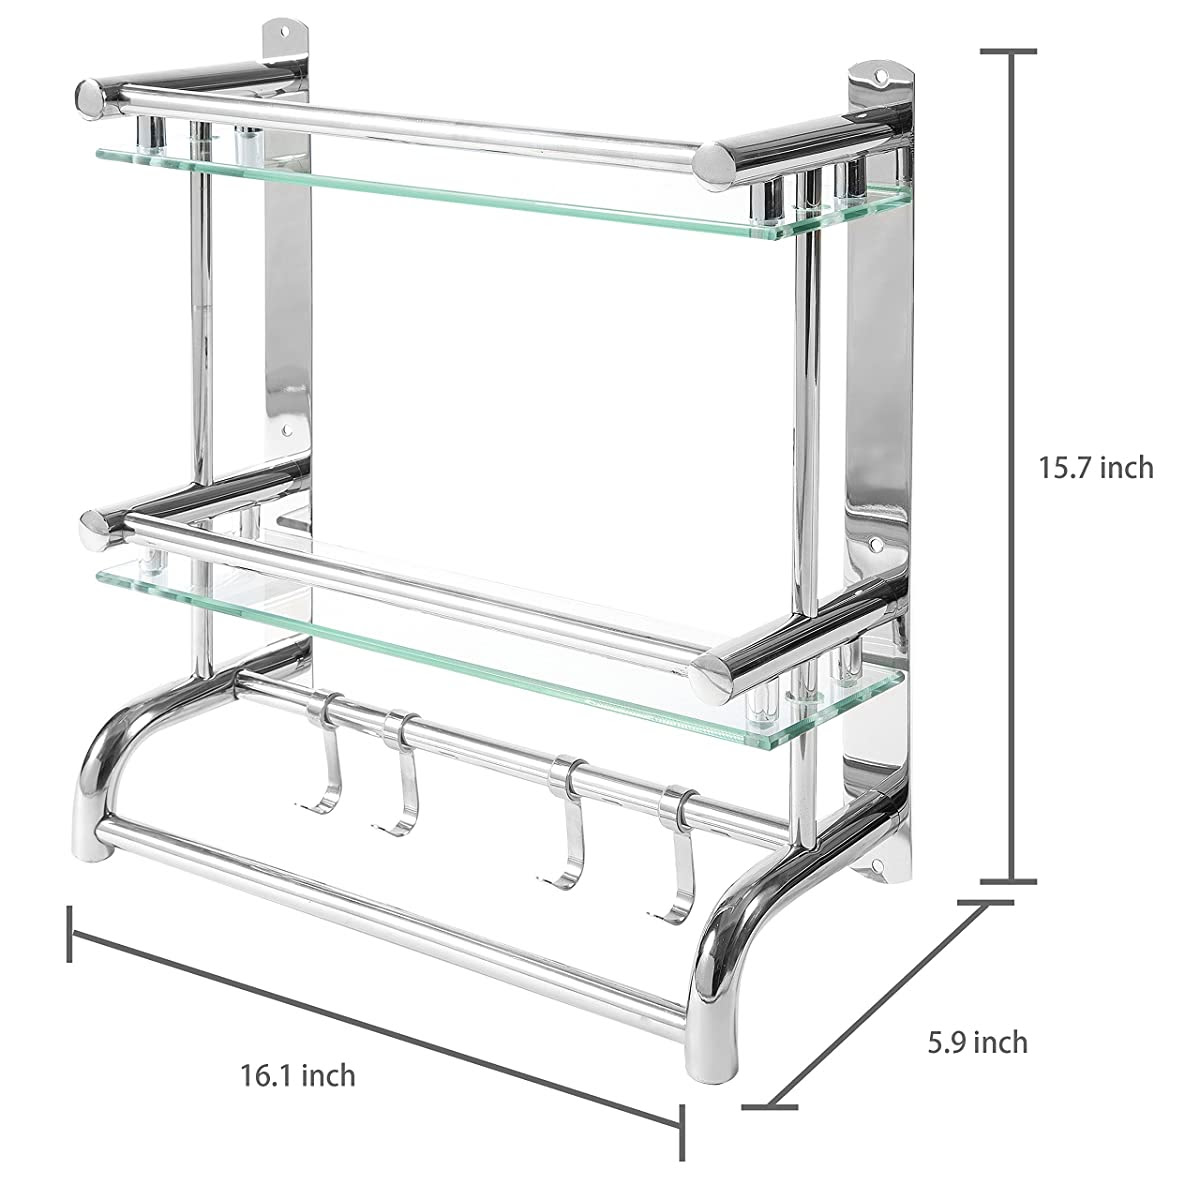 Mygift Wall Mounted Stainless Steel Bathroom Shelf Rack 2 Tier